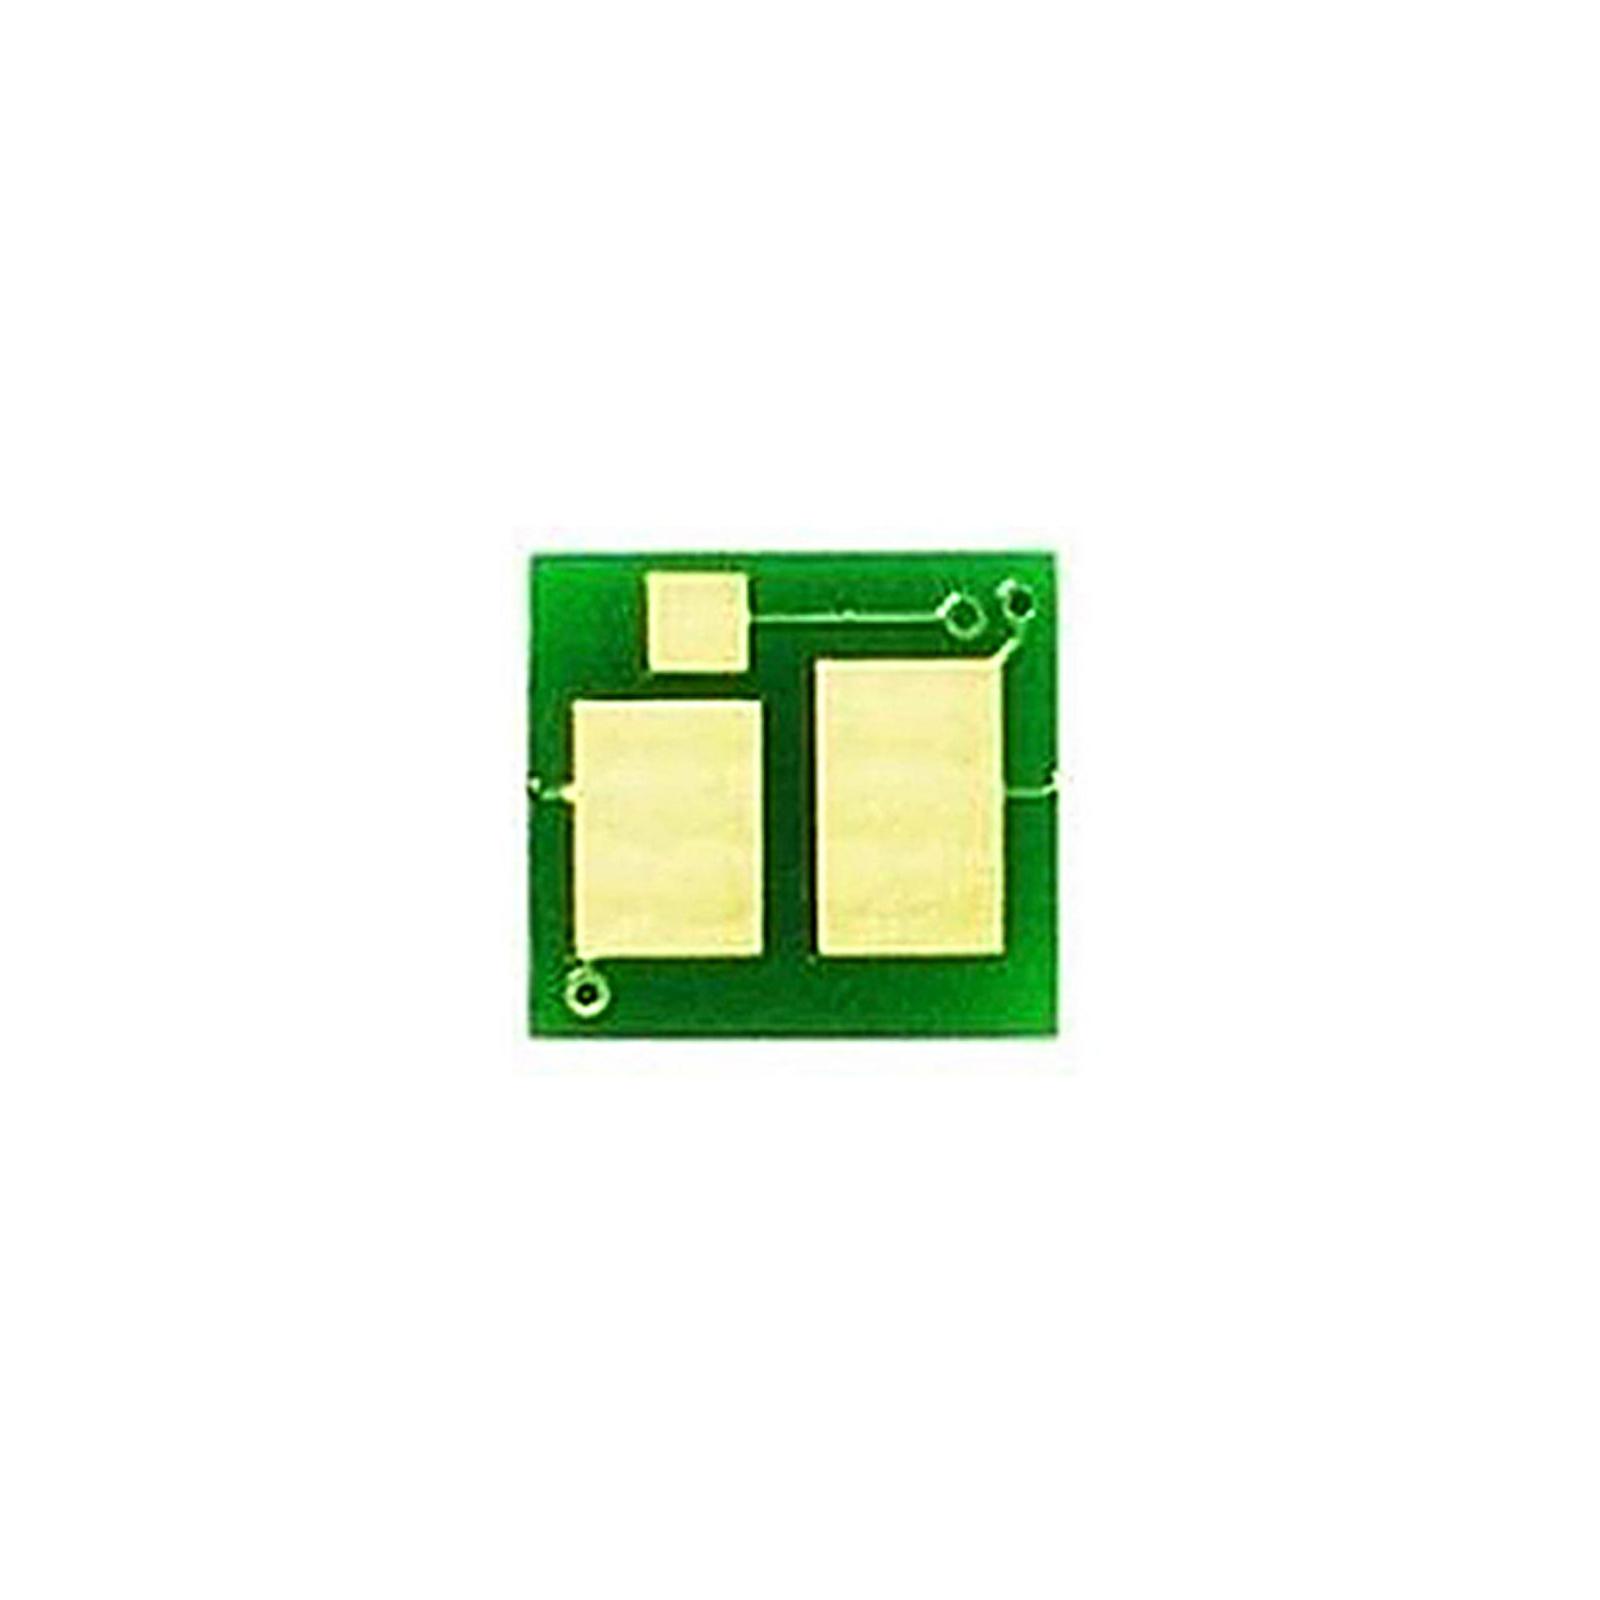 Чип для картриджа HP CLJ M254 (CF540X) 3.2k black Static Control (HM254CP-HYKEU)